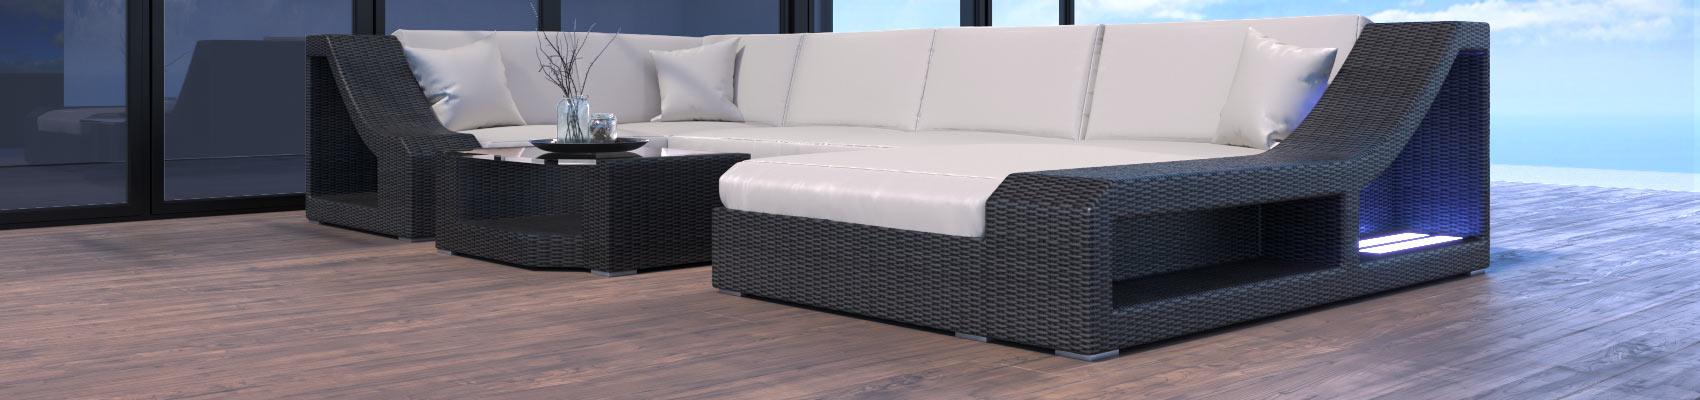 rattan sofas in u form lounge rattansofas sofa dreams. Black Bedroom Furniture Sets. Home Design Ideas